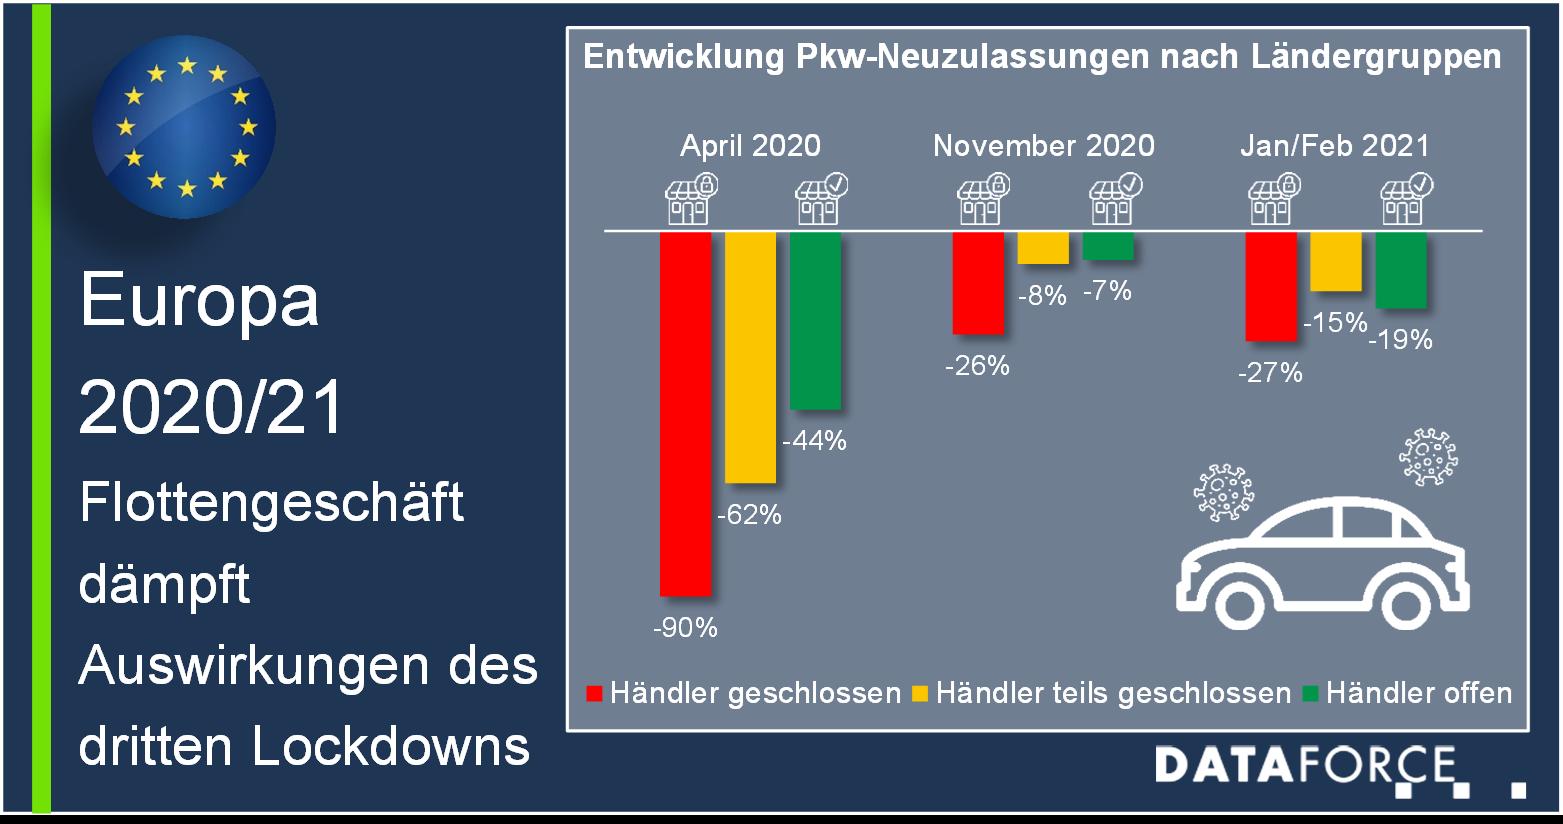 Dataforce Infografik Lockdown-Einfluss auf PKW-Neuzulassungen im April 2020, November 2020, Januar Februar 2021 in Europa